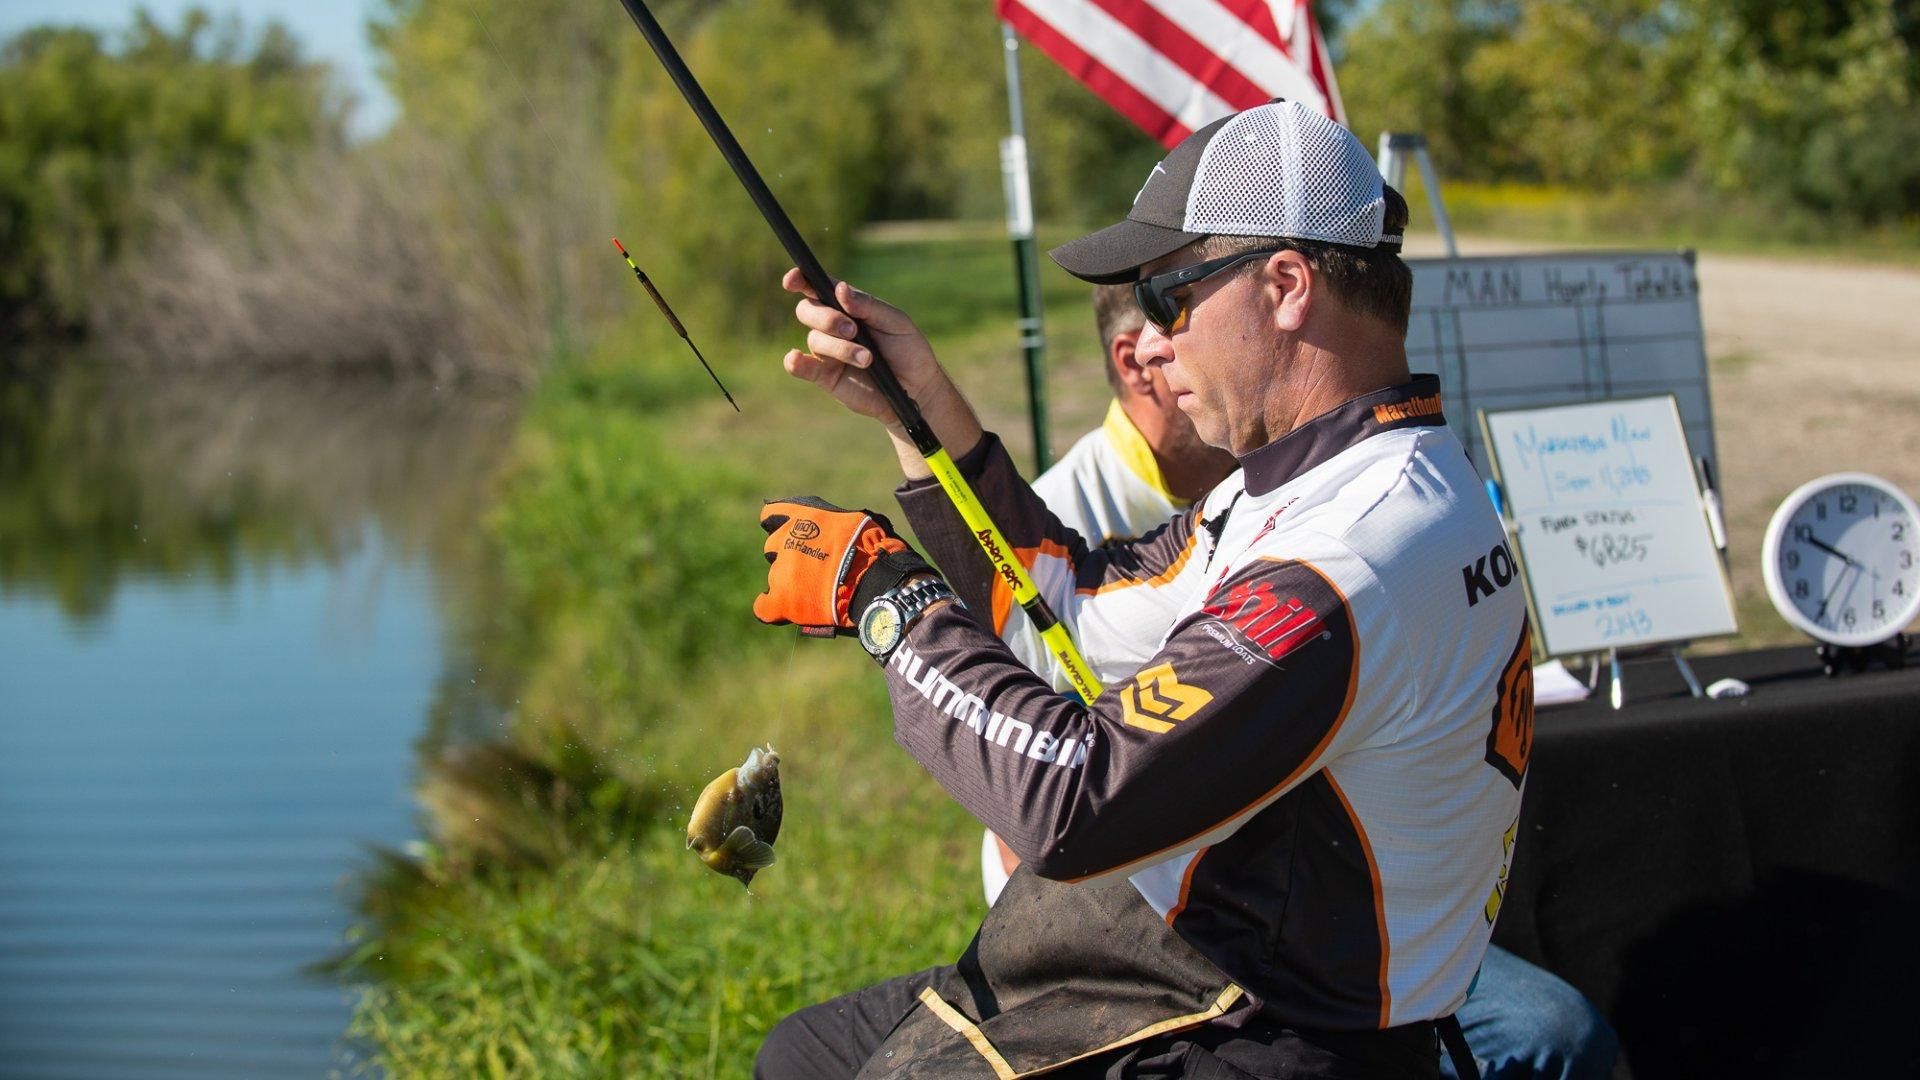 Jeff Kolodzinski rekorder horgász